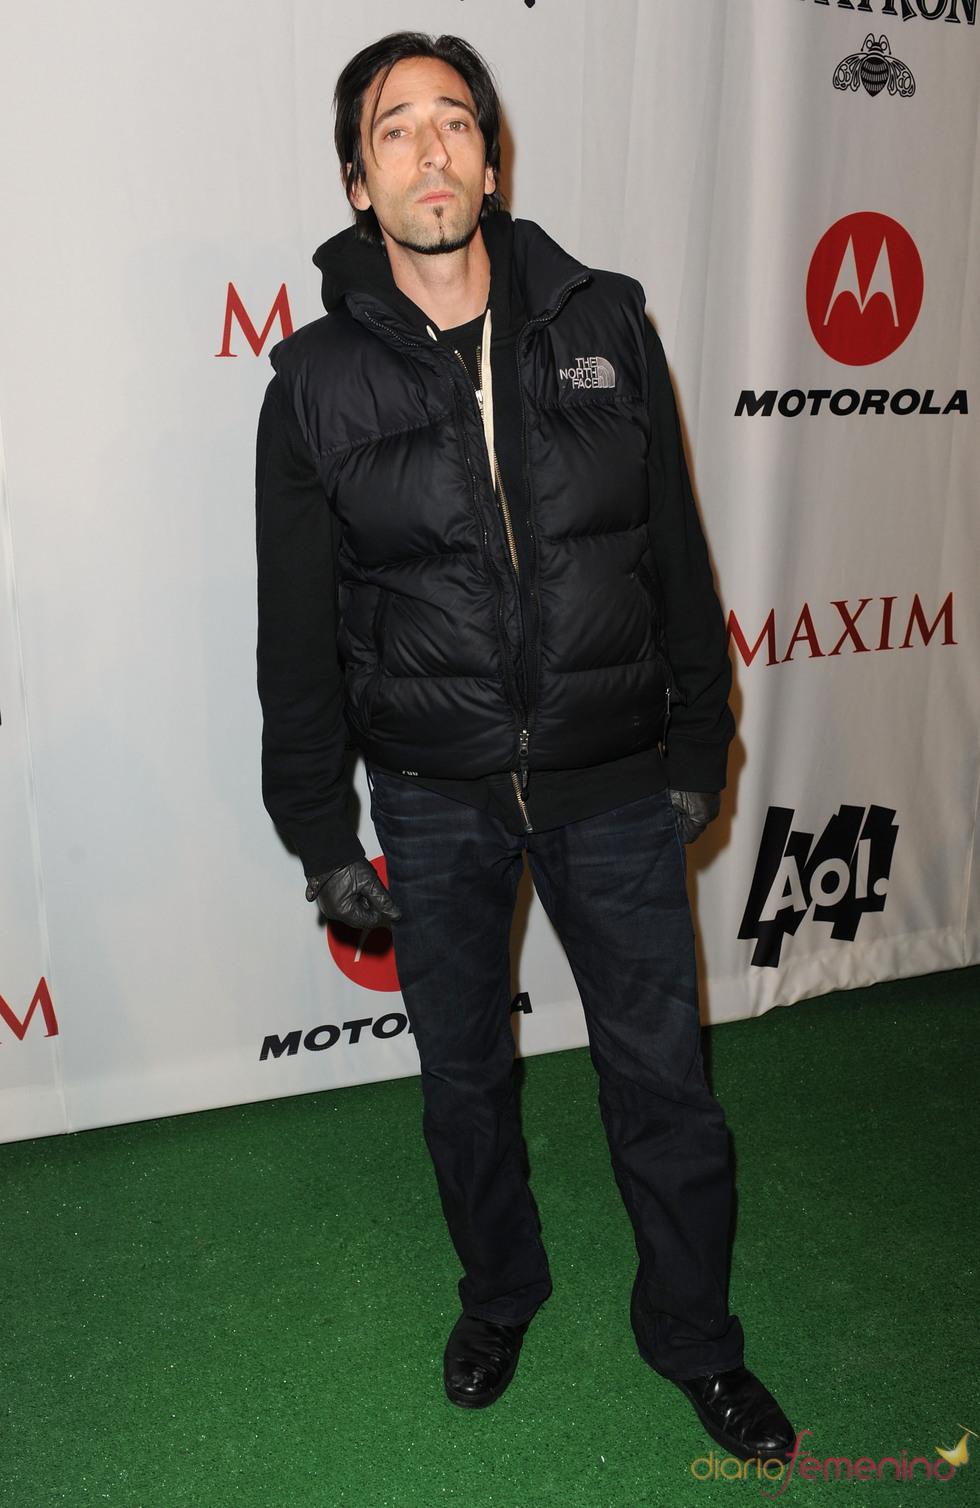 Adrien Brody no quiso perderse la fiesta previa a la Super Bowl 2011